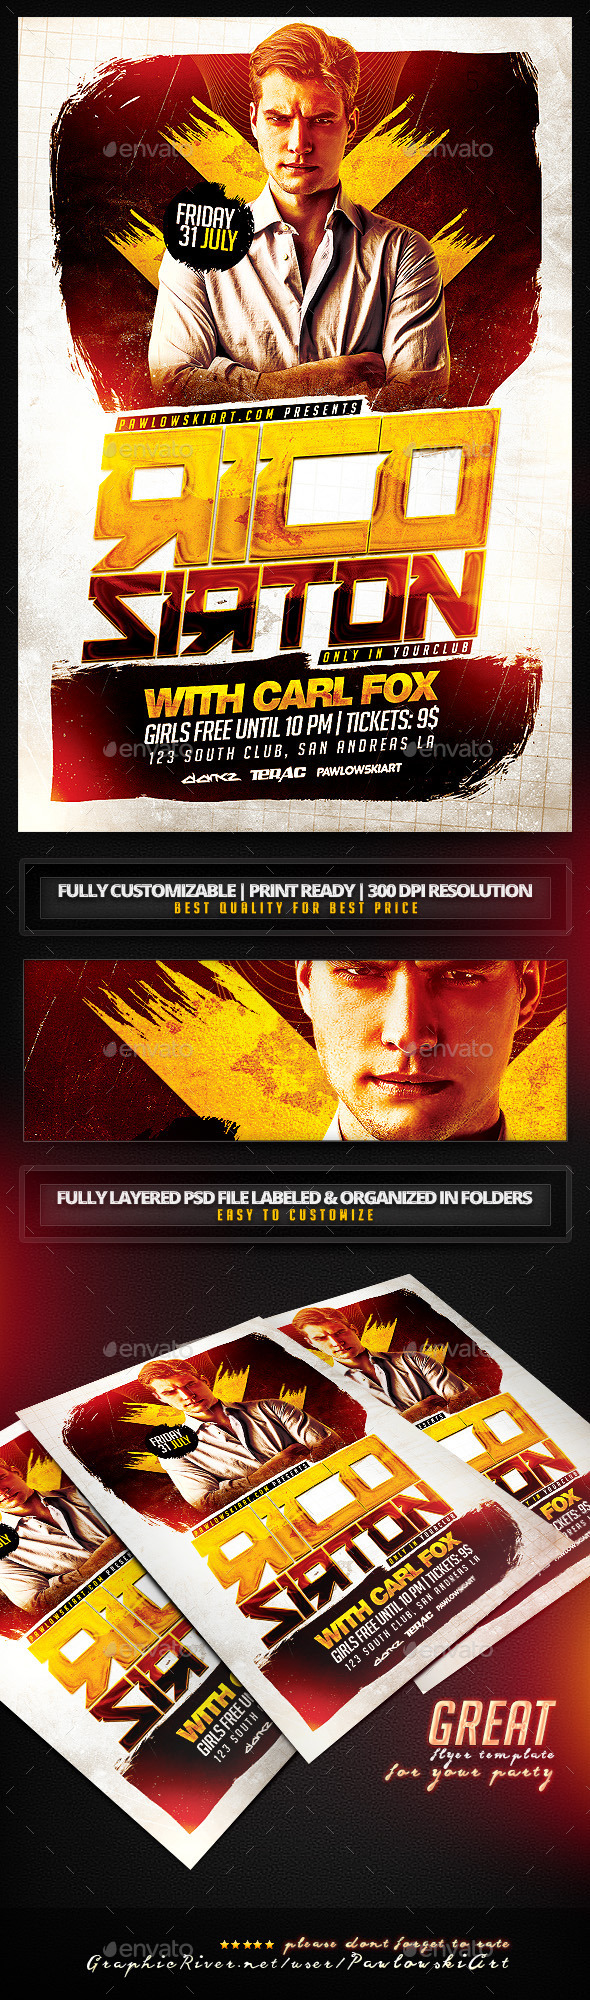 GraphicRiver Special Guest DJ v4 PSD Flyer Template 11821896